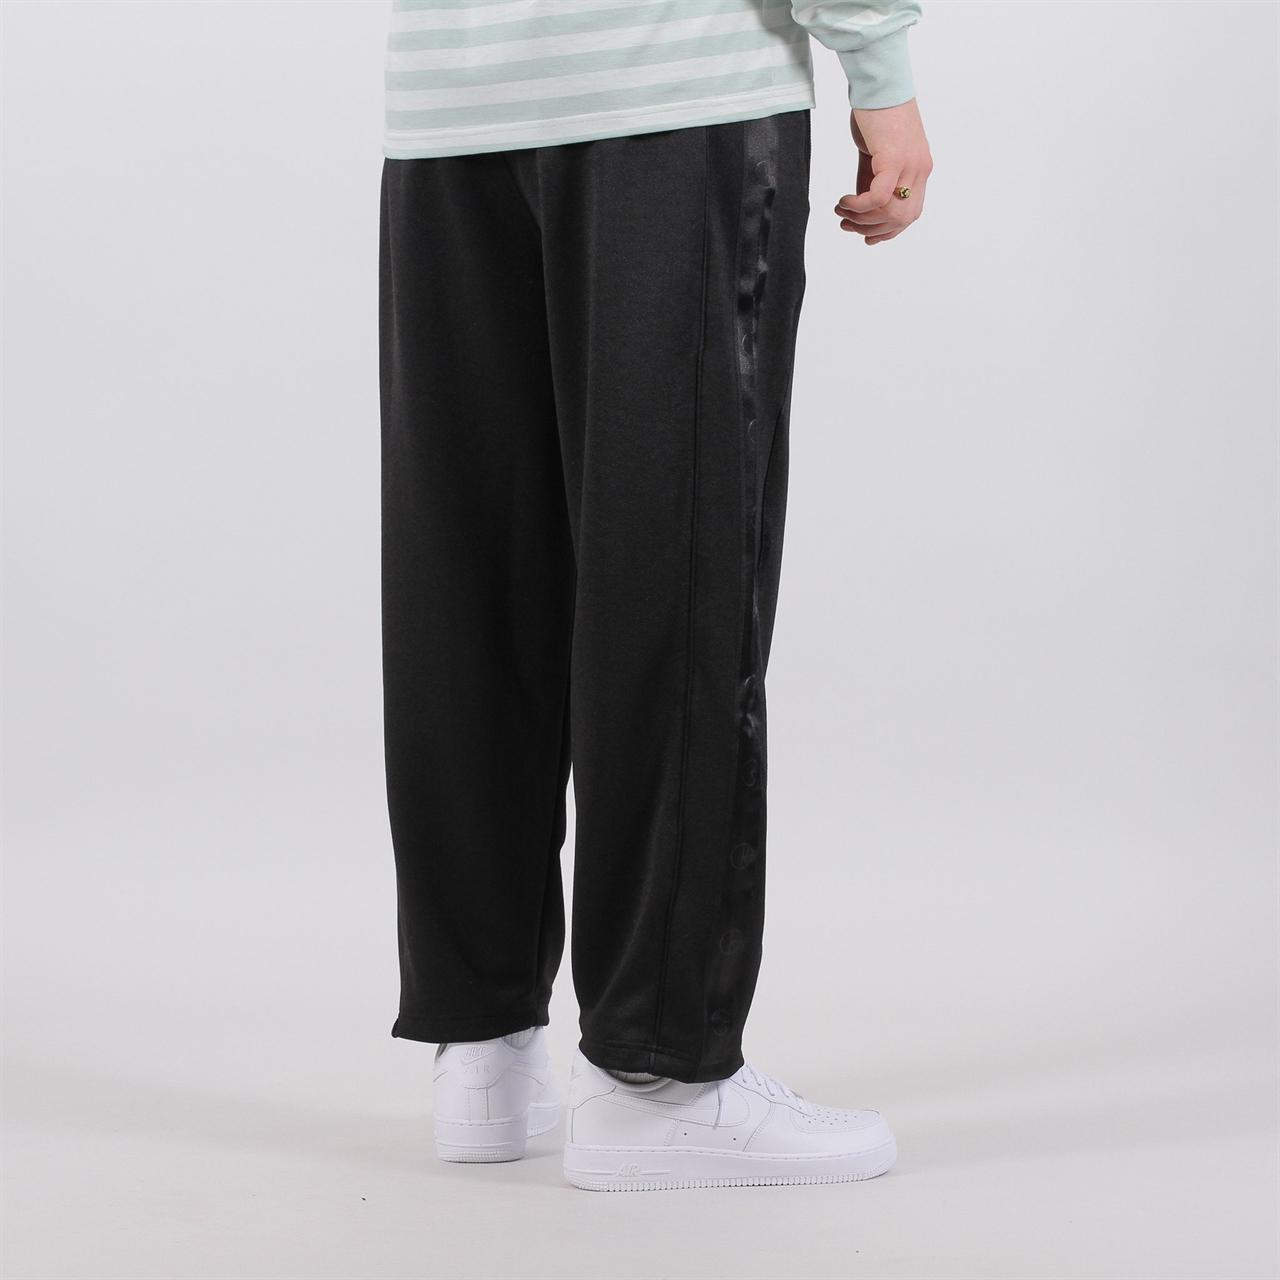 Shelta - Polar Skate Co. Track Pants (TRPN-BLK) 00ae52632618